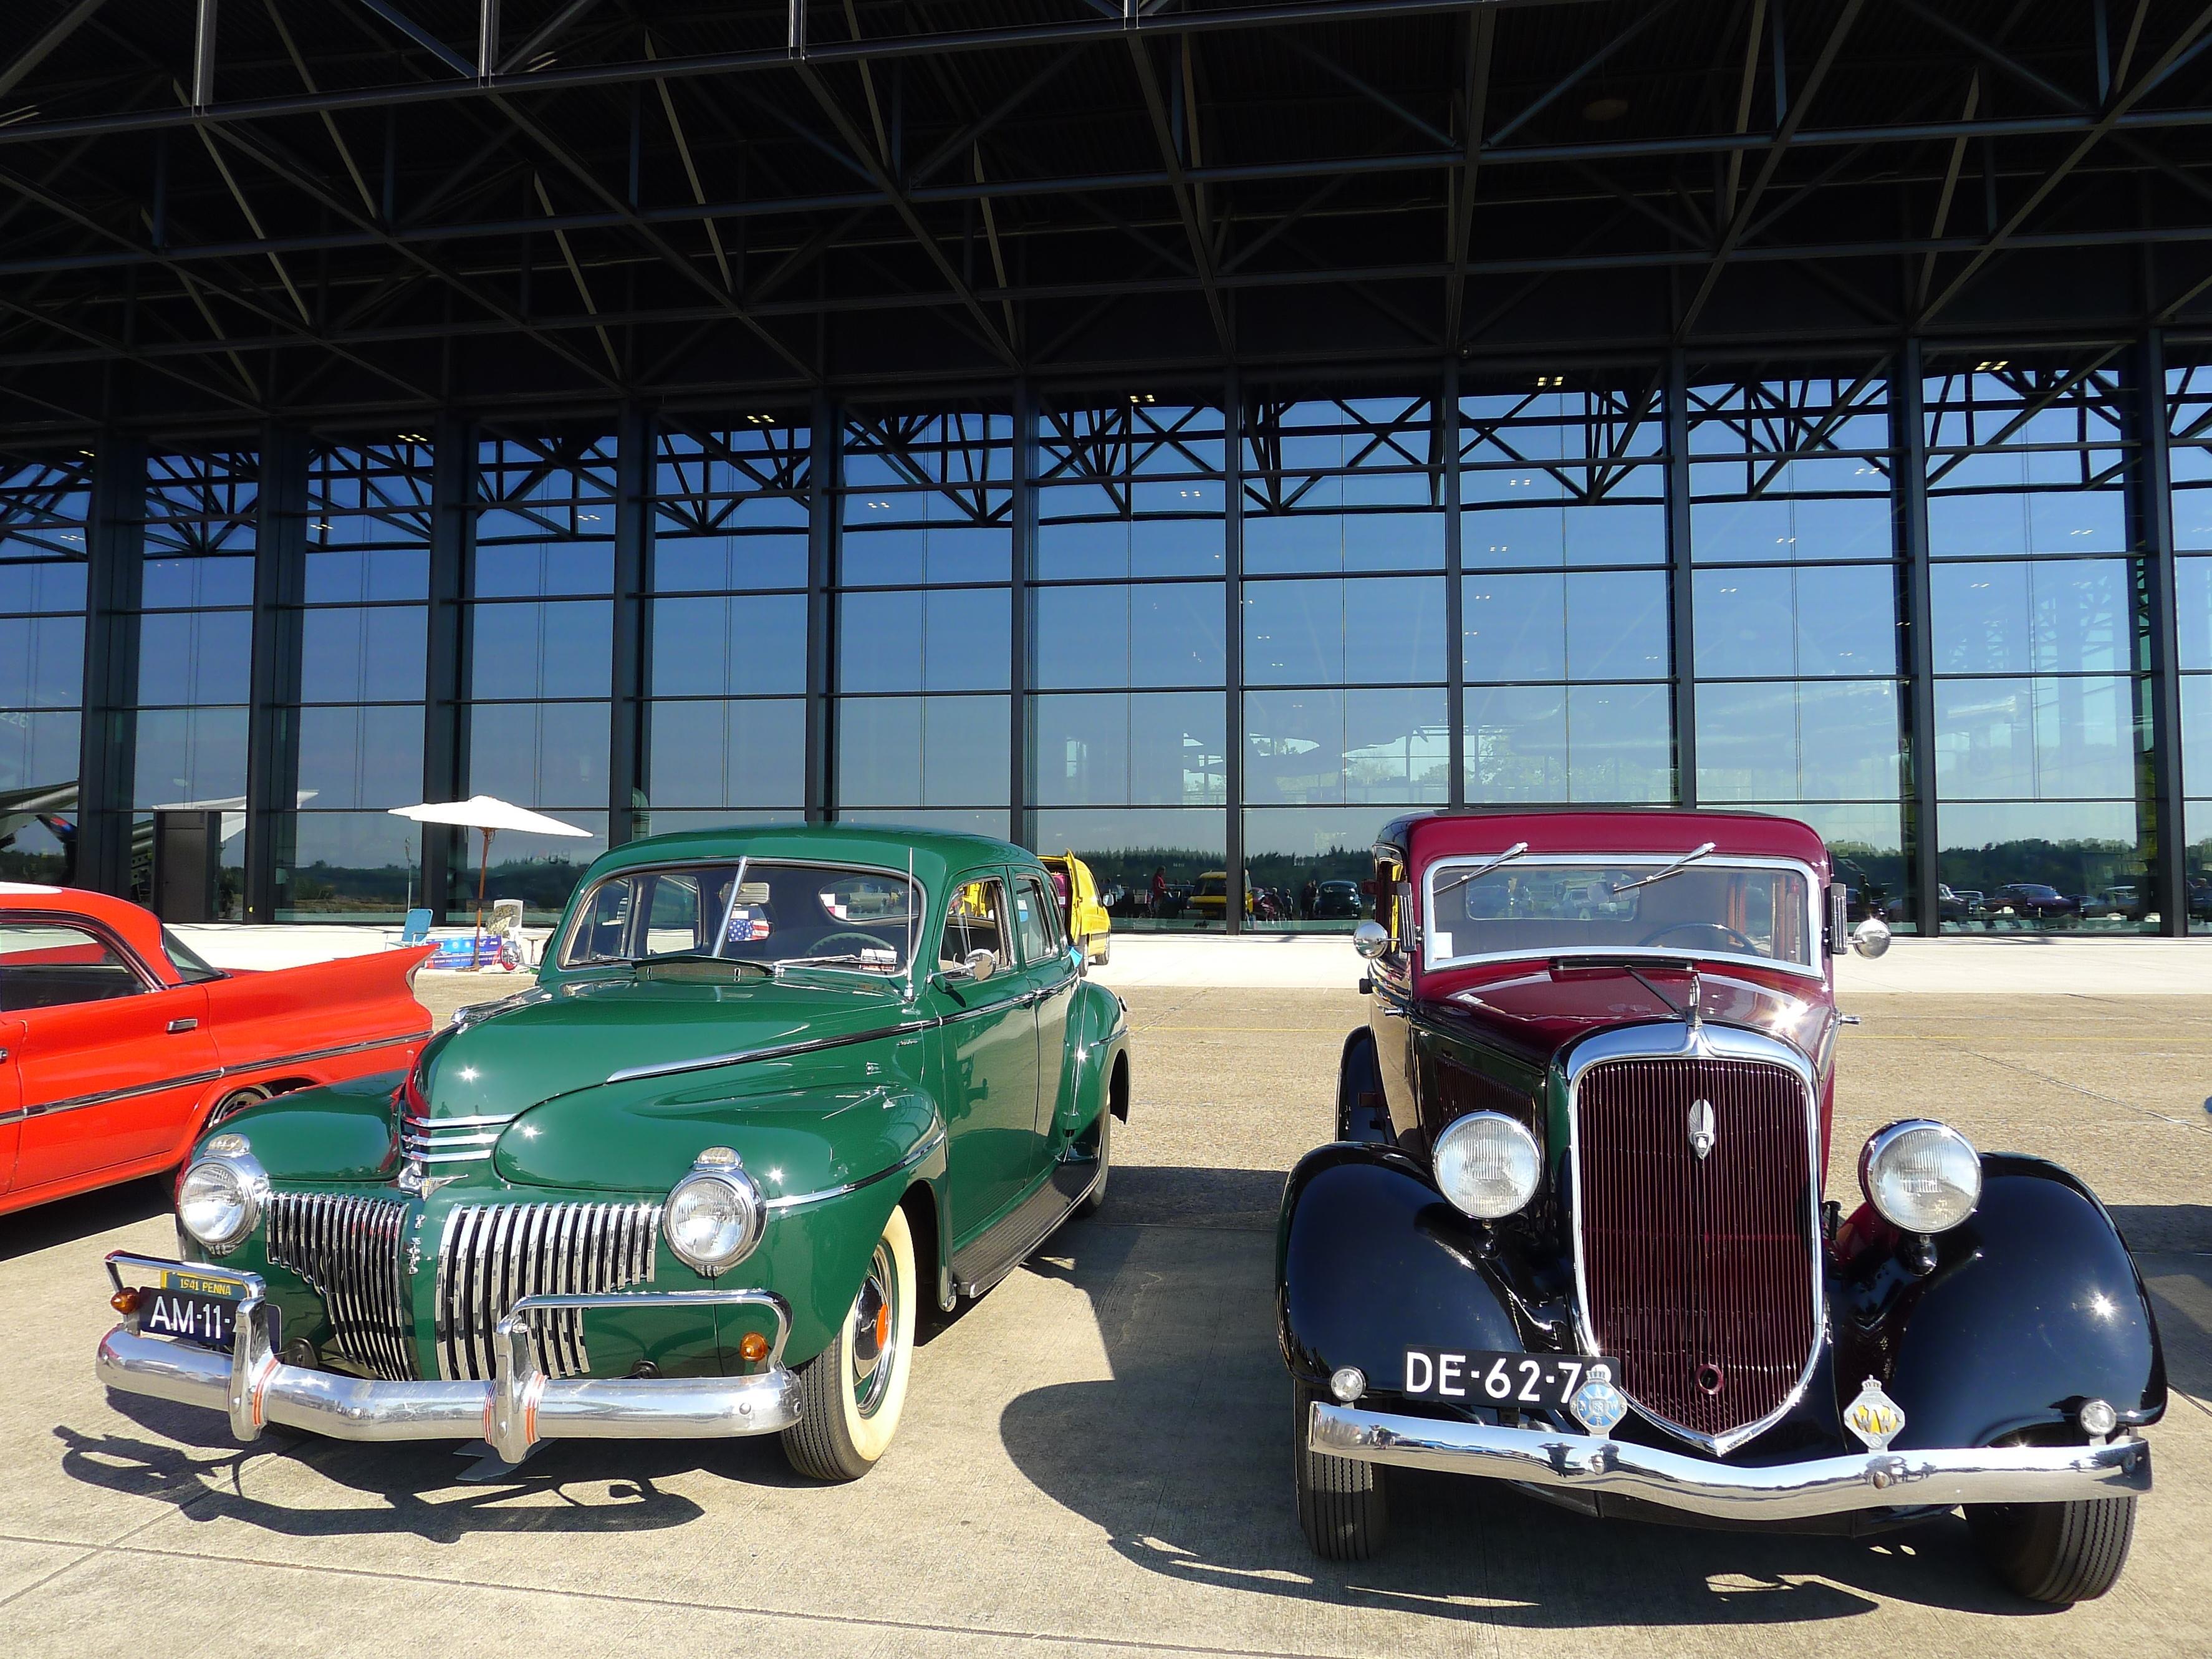 050_Nederland_Soesterberg_Dutch_Chrysler_USA_Classic_Car_Meeting_2016_@_Nationaal_militair_museum